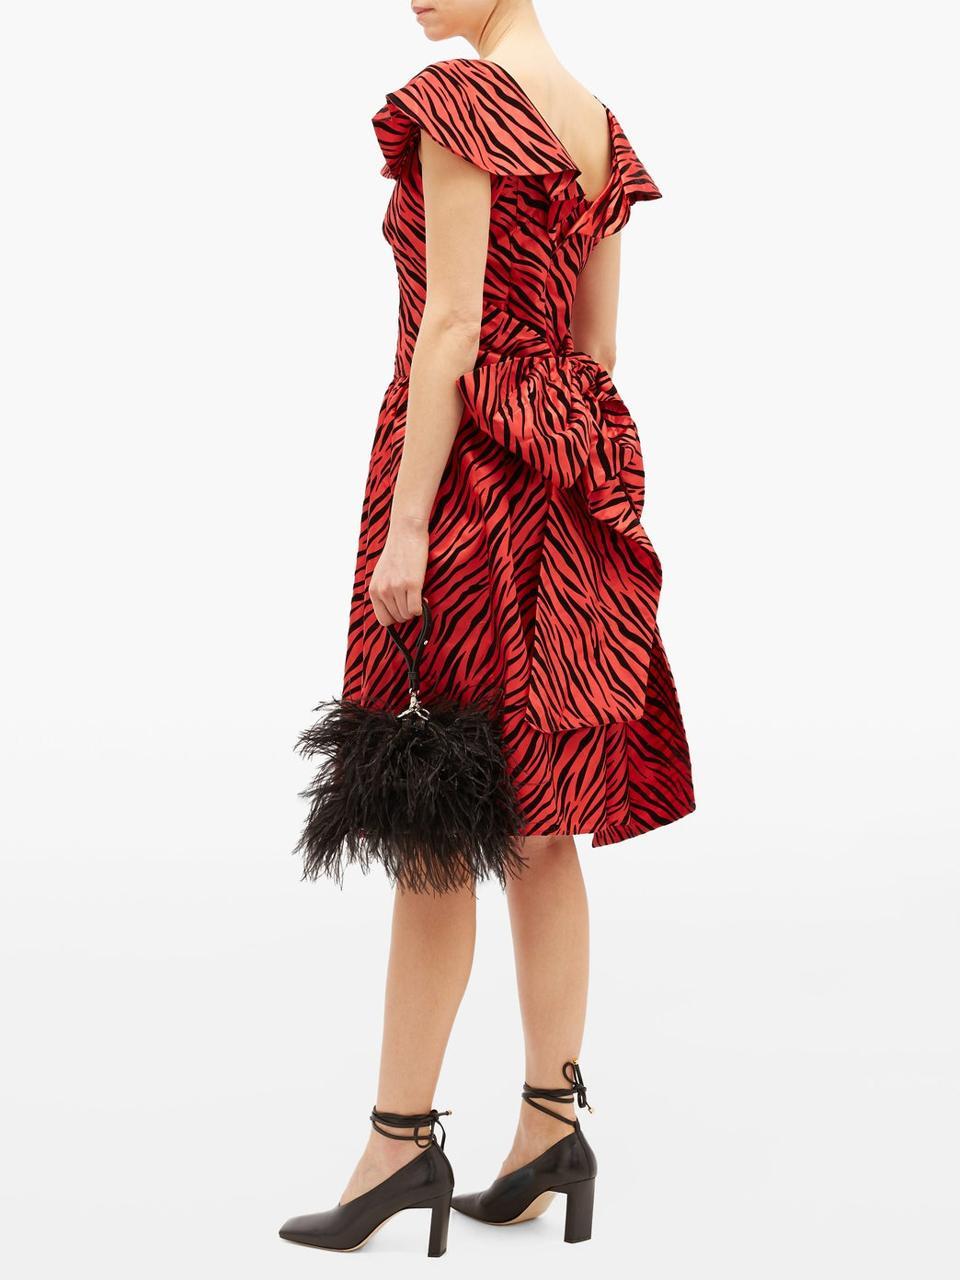 Flocked zebra-print satin dress